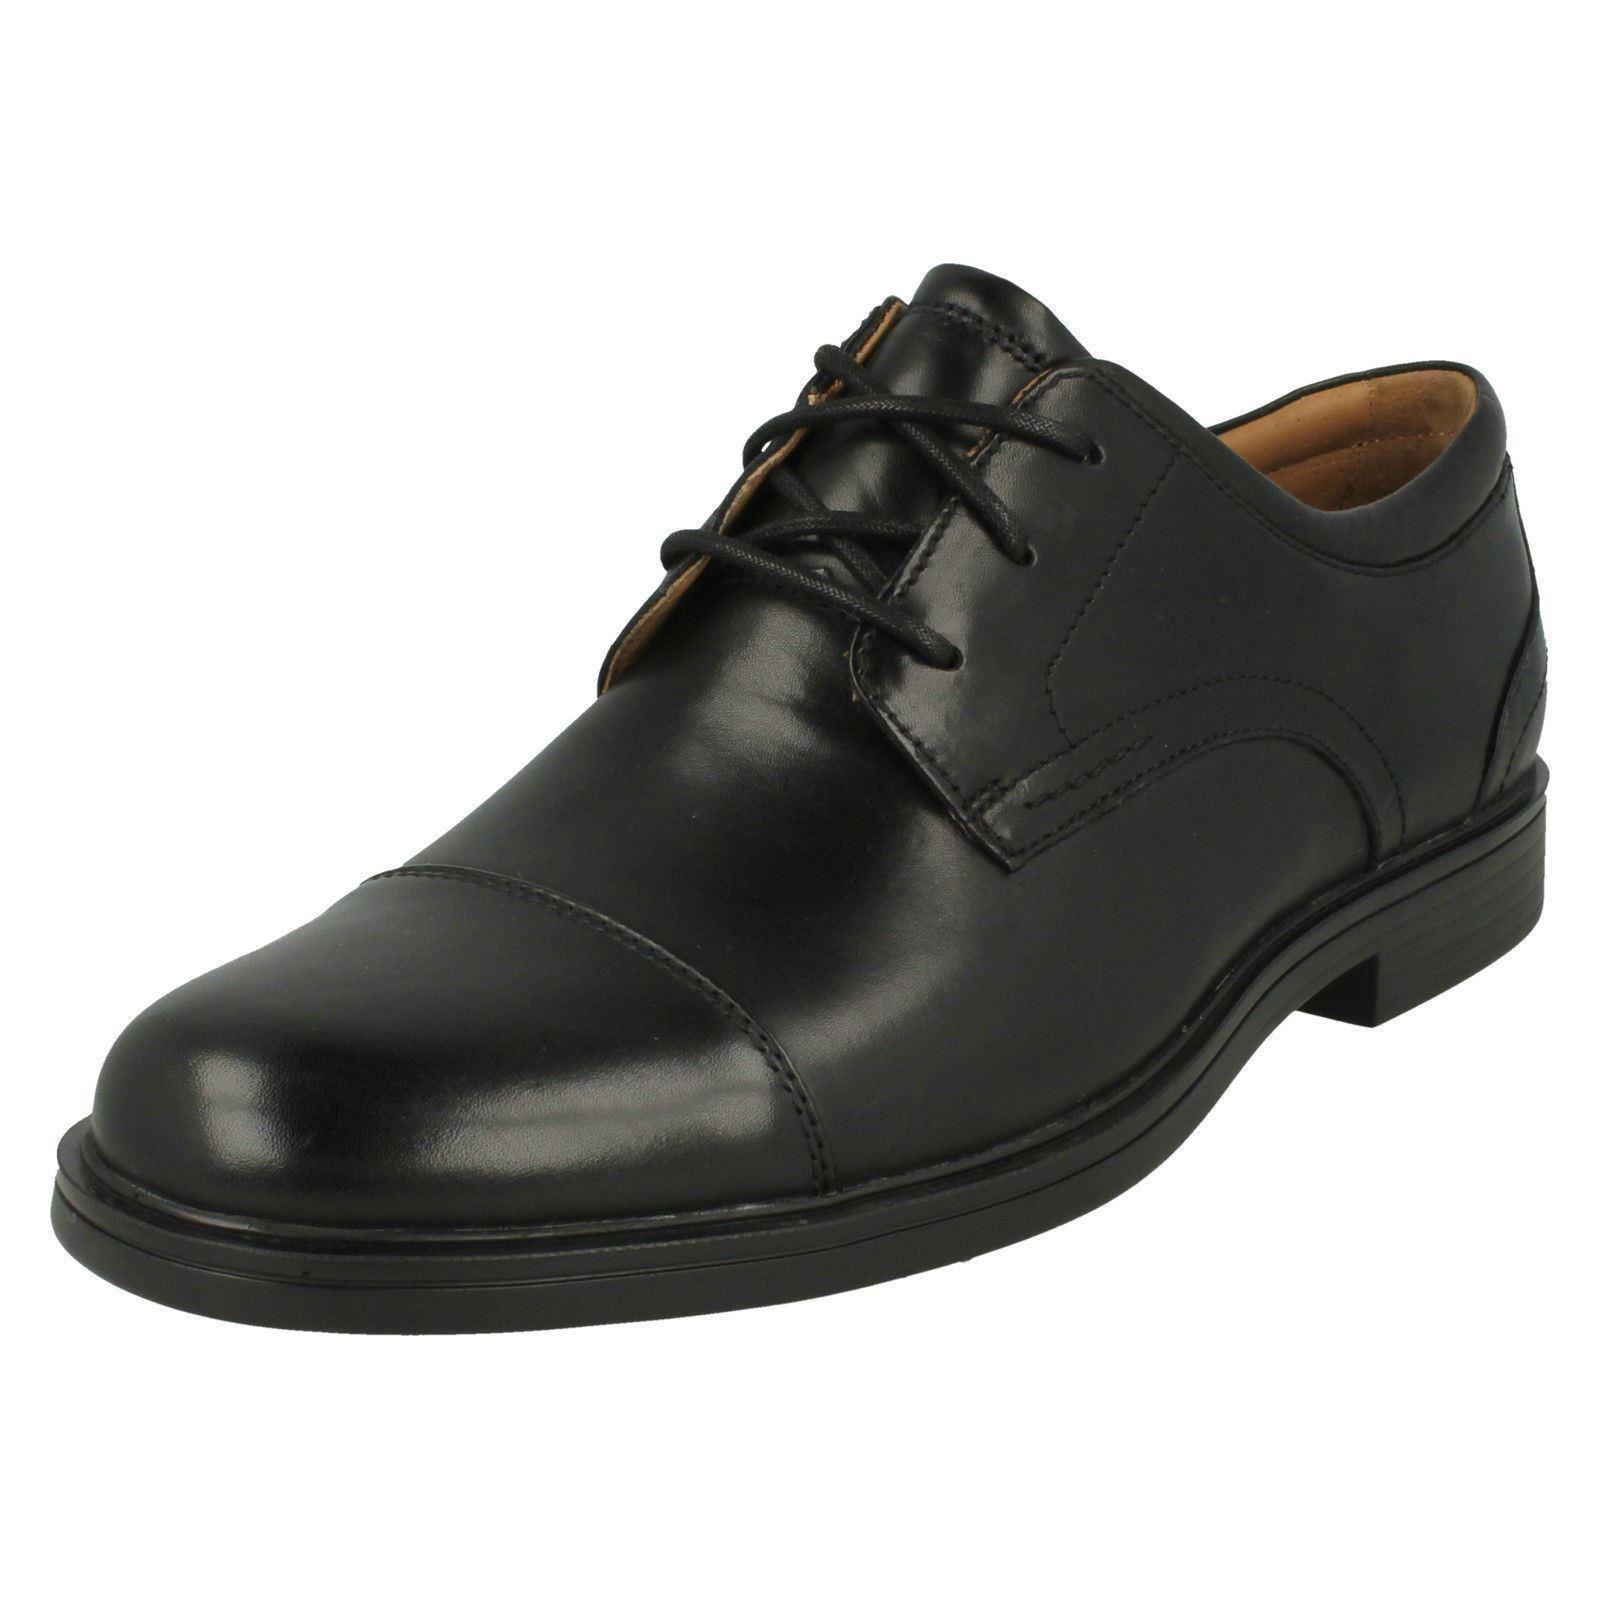 Uomo Clark Formal Leder Rounded Toe Lace Up Leder Formal Schuhes Un Aldric Cap b9a0bc